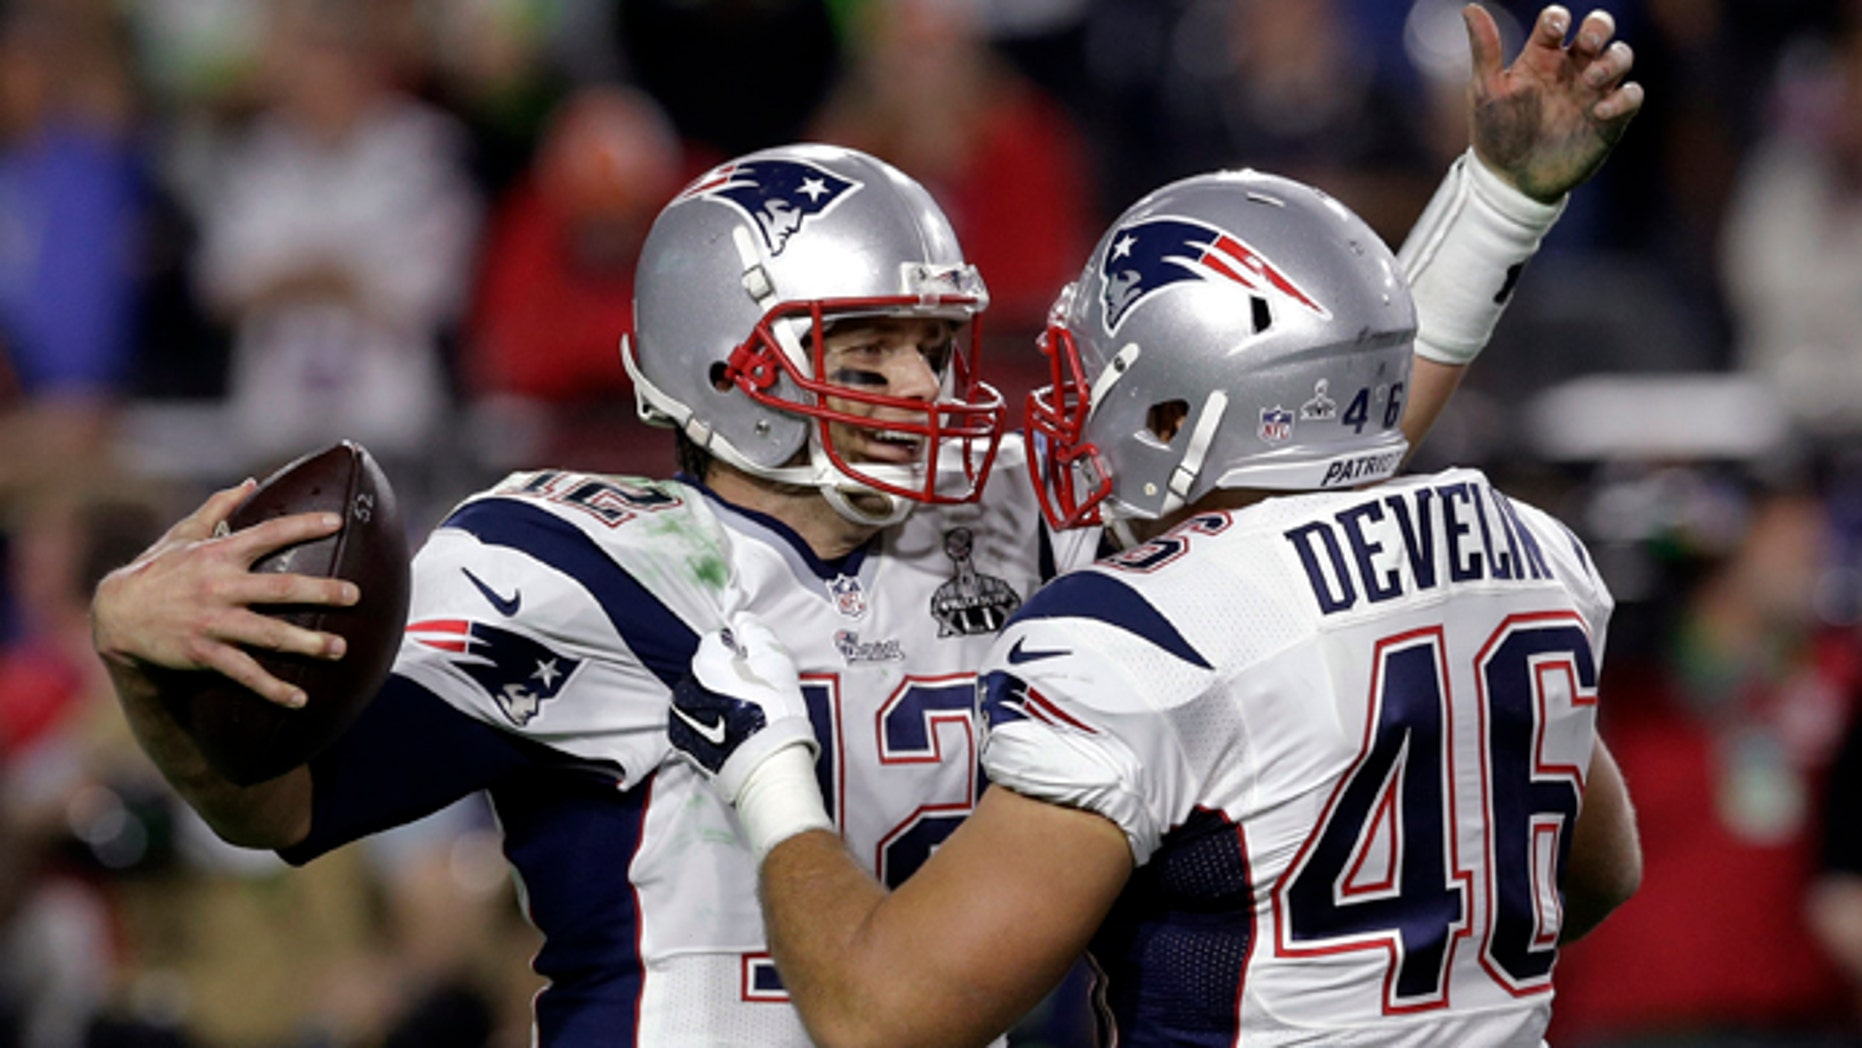 Feb. 1, 2015: New England Patriots quarterback Tom Brady (12) celebrates with New England Patriots fullback James Develin (46) after NFL Super Bowl XLIX football game against the Seattle Seahawks in Glendale, Ariz. (AP Photo/Patrick Semansky)